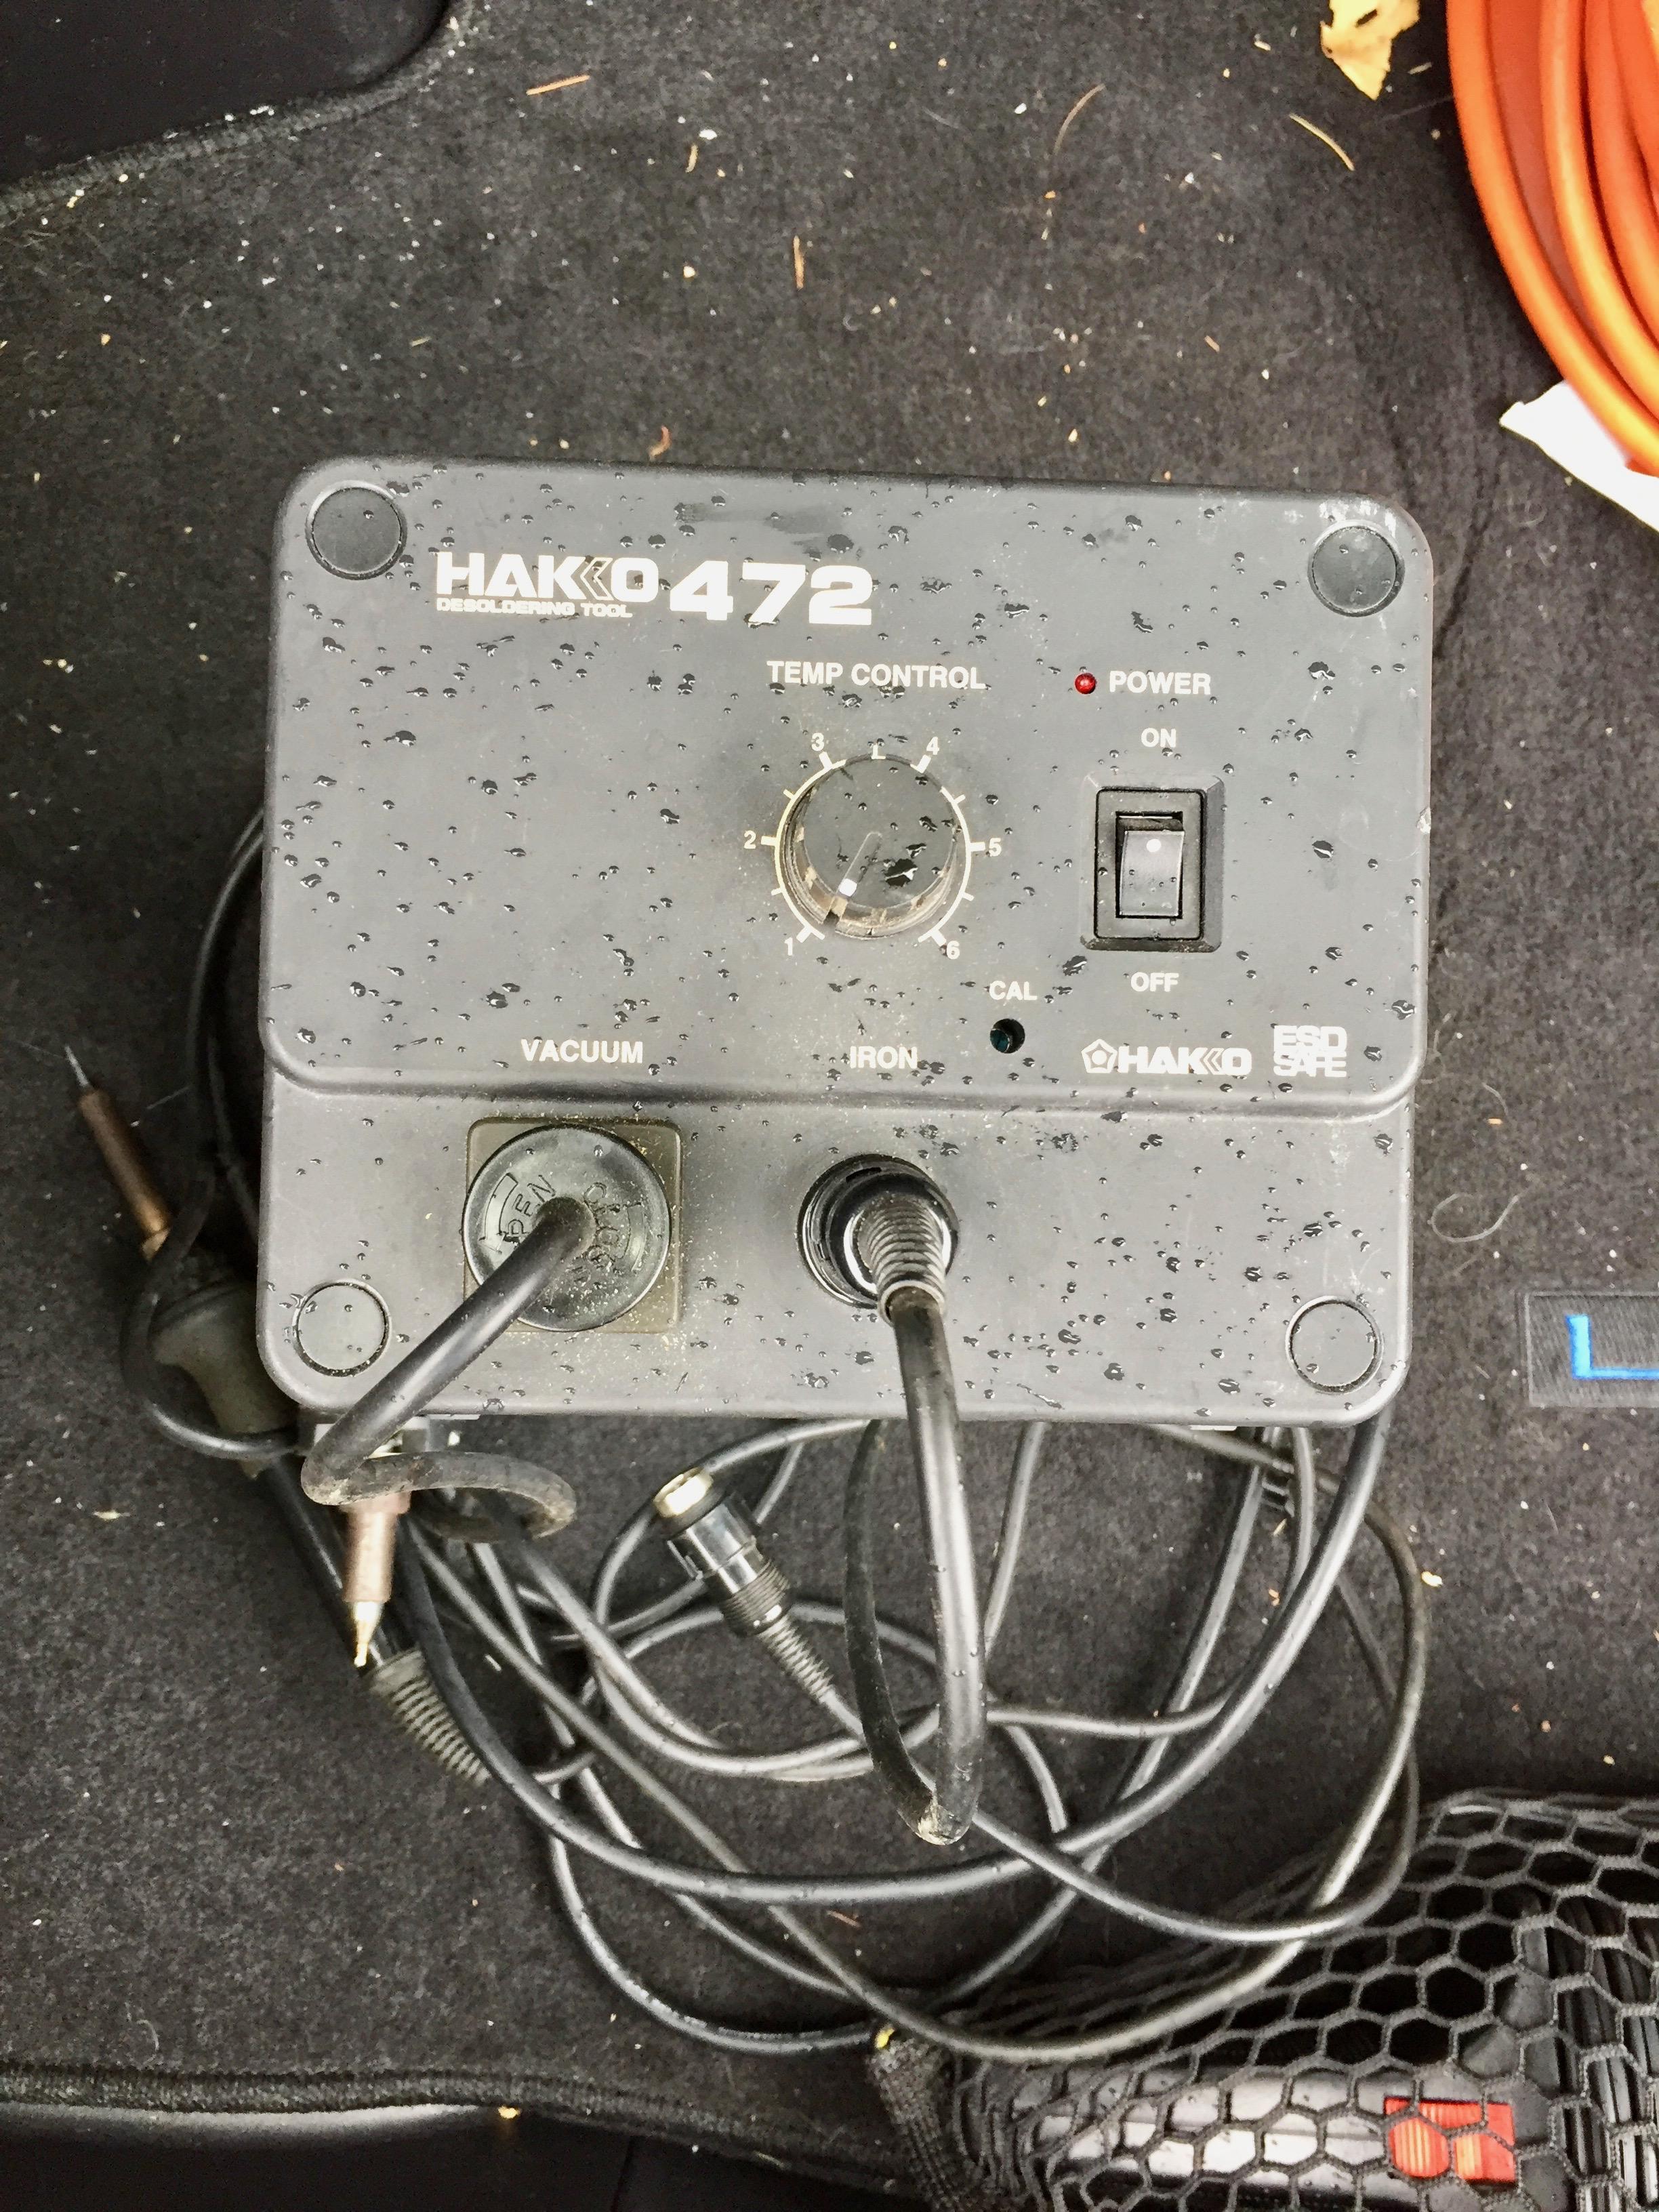 Hakko 472 1 Desoldering Tool Steves Web Junkyard Steve Byan Basic Electrical Wiring About Img 4595